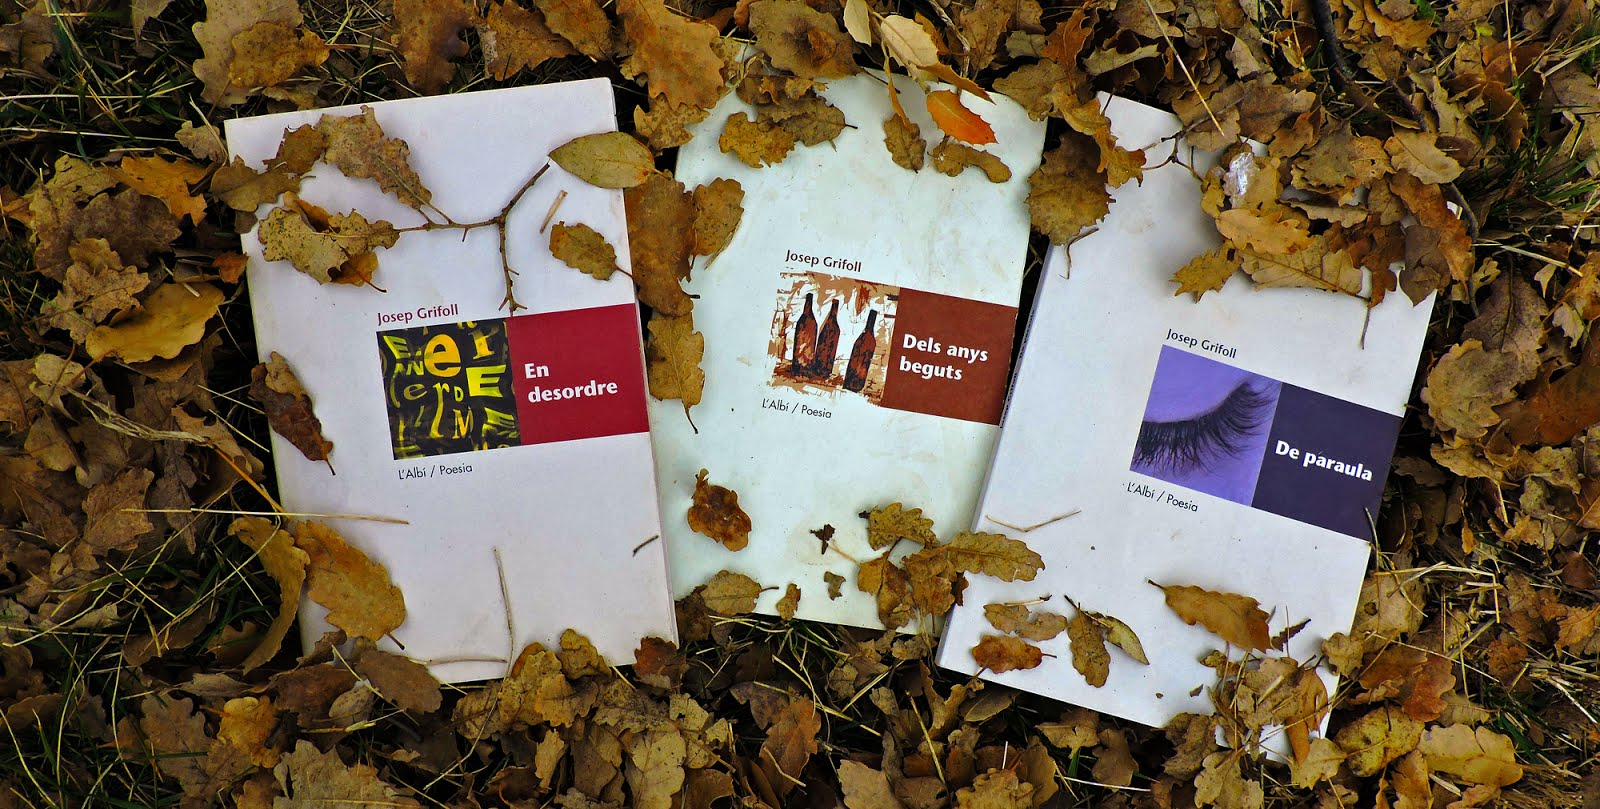 llibres griFOLL